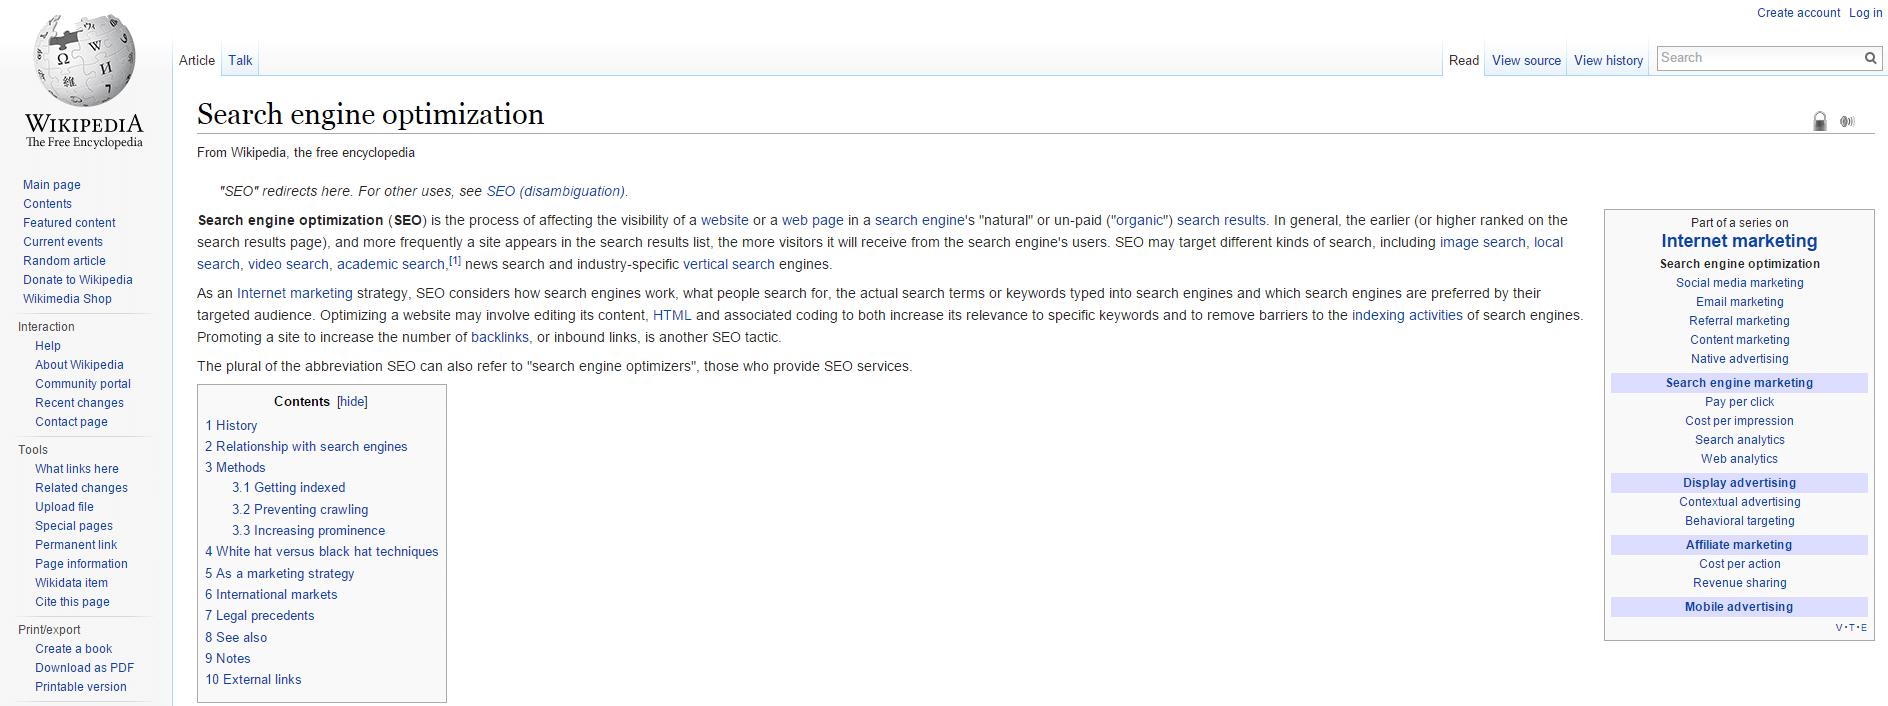 Using Wikipedia for SEO